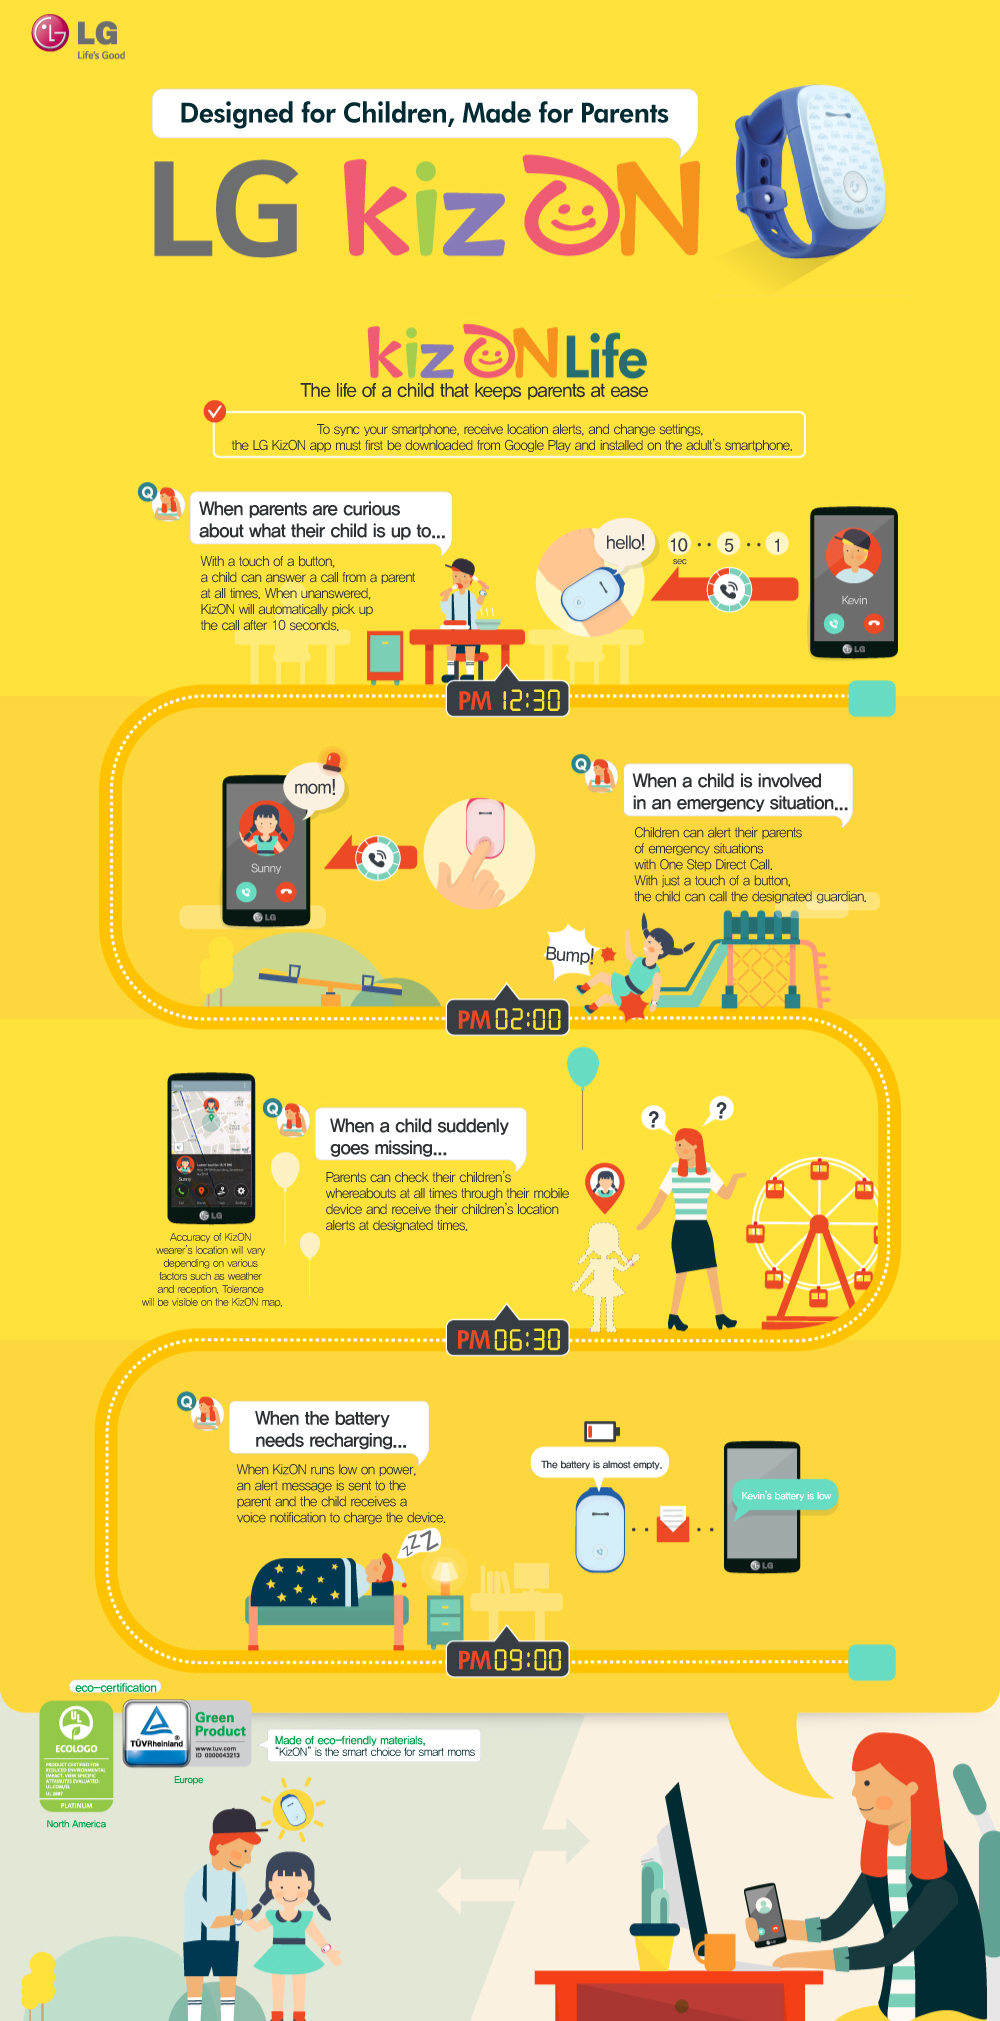 LG_KizON_Infographic.jpg